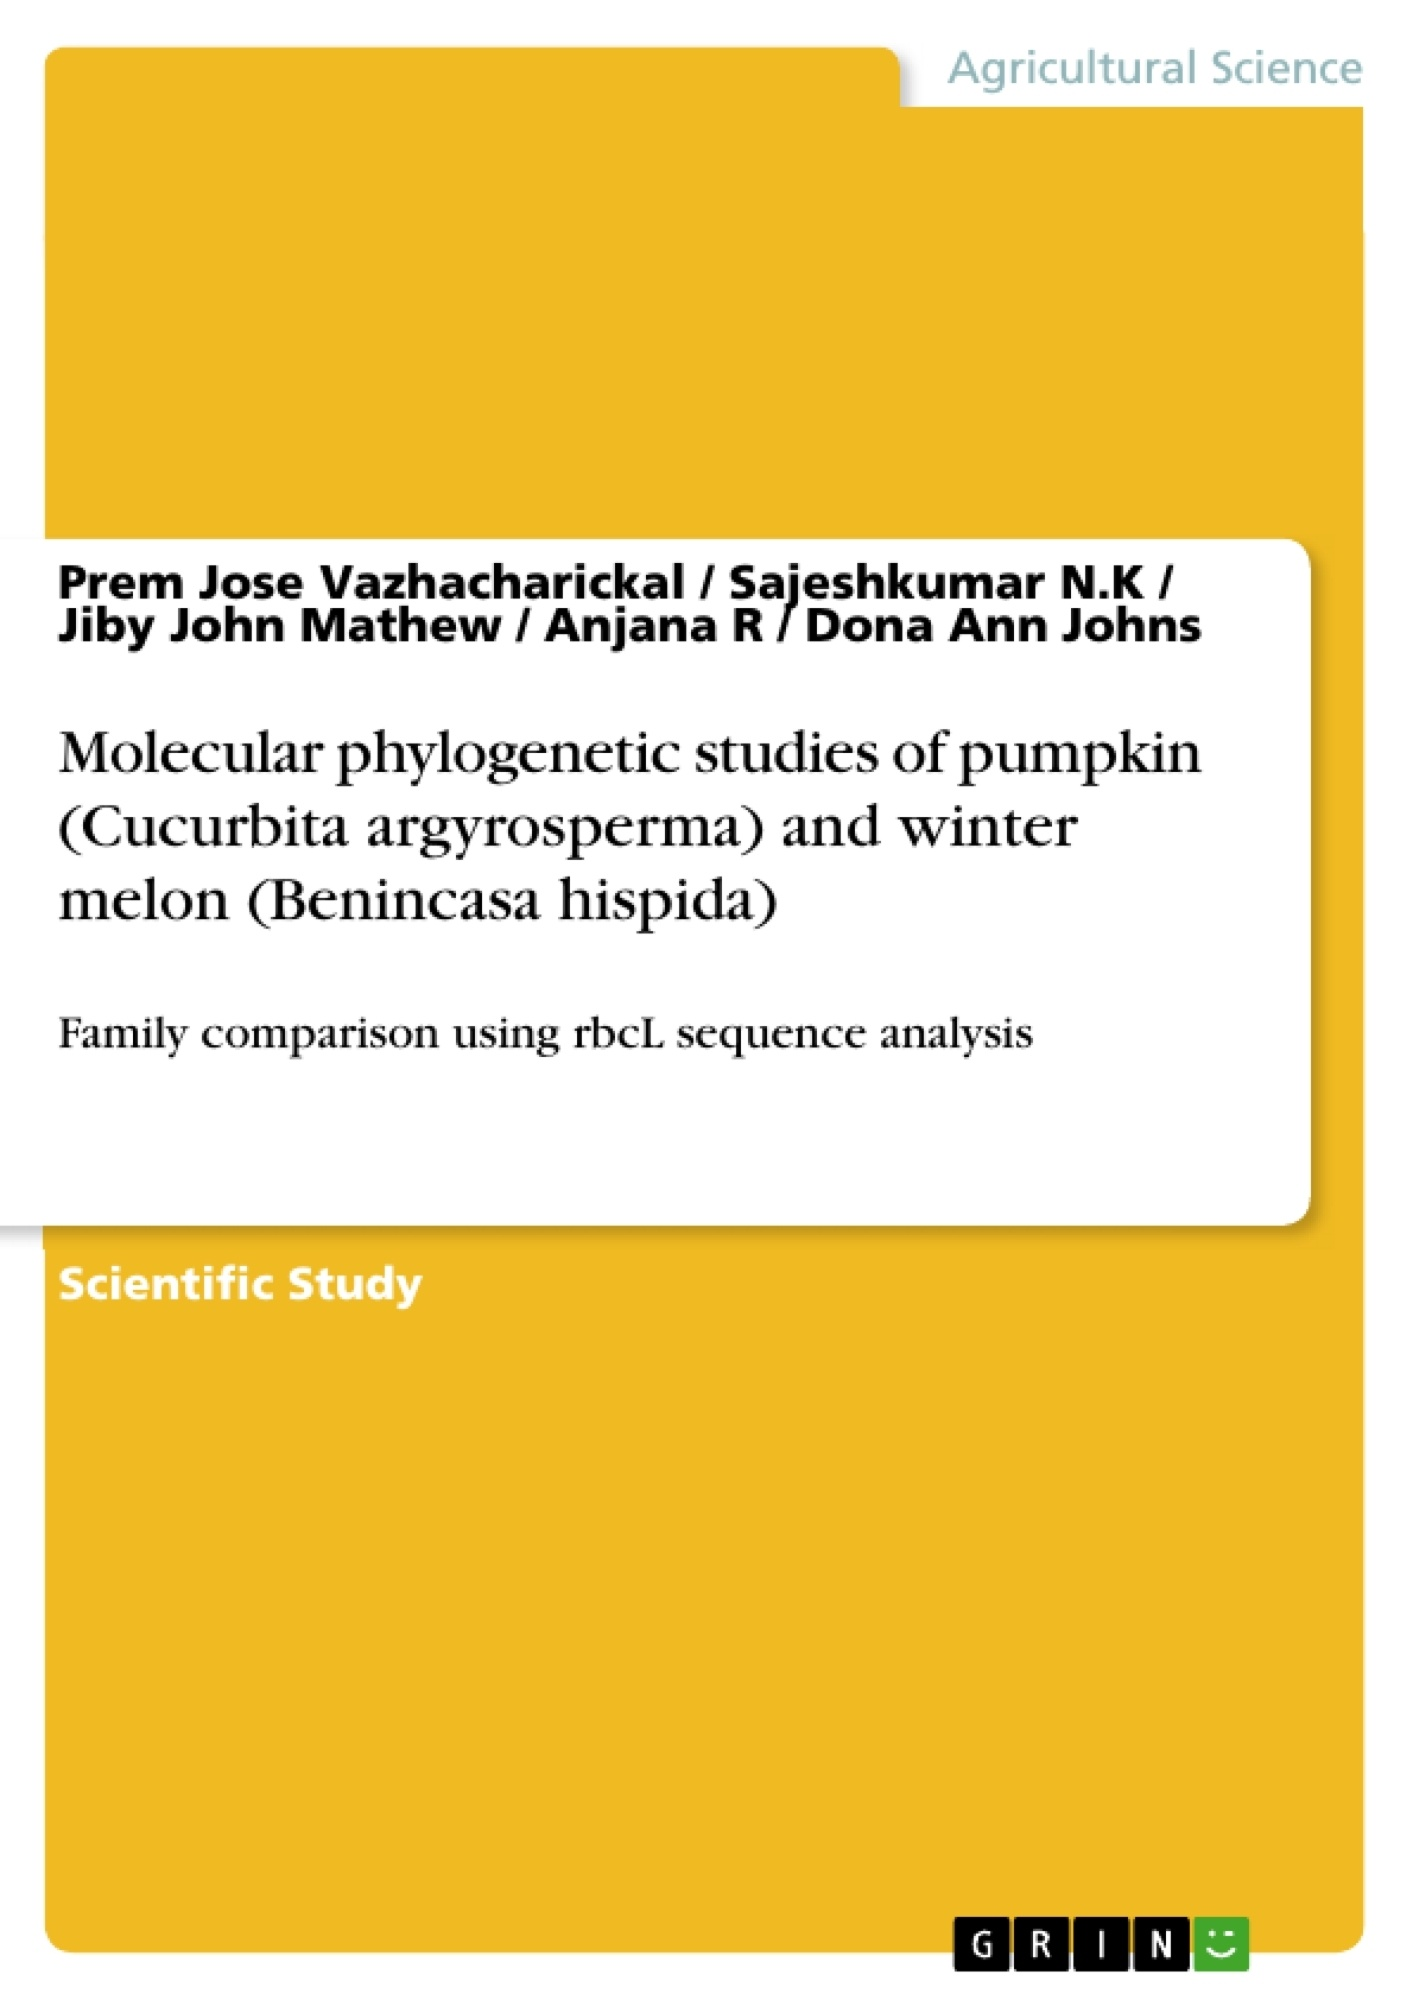 Title: Molecular phylogenetic studies of pumpkin (Cucurbita argyrosperma) and winter melon (Benincasa hispida)